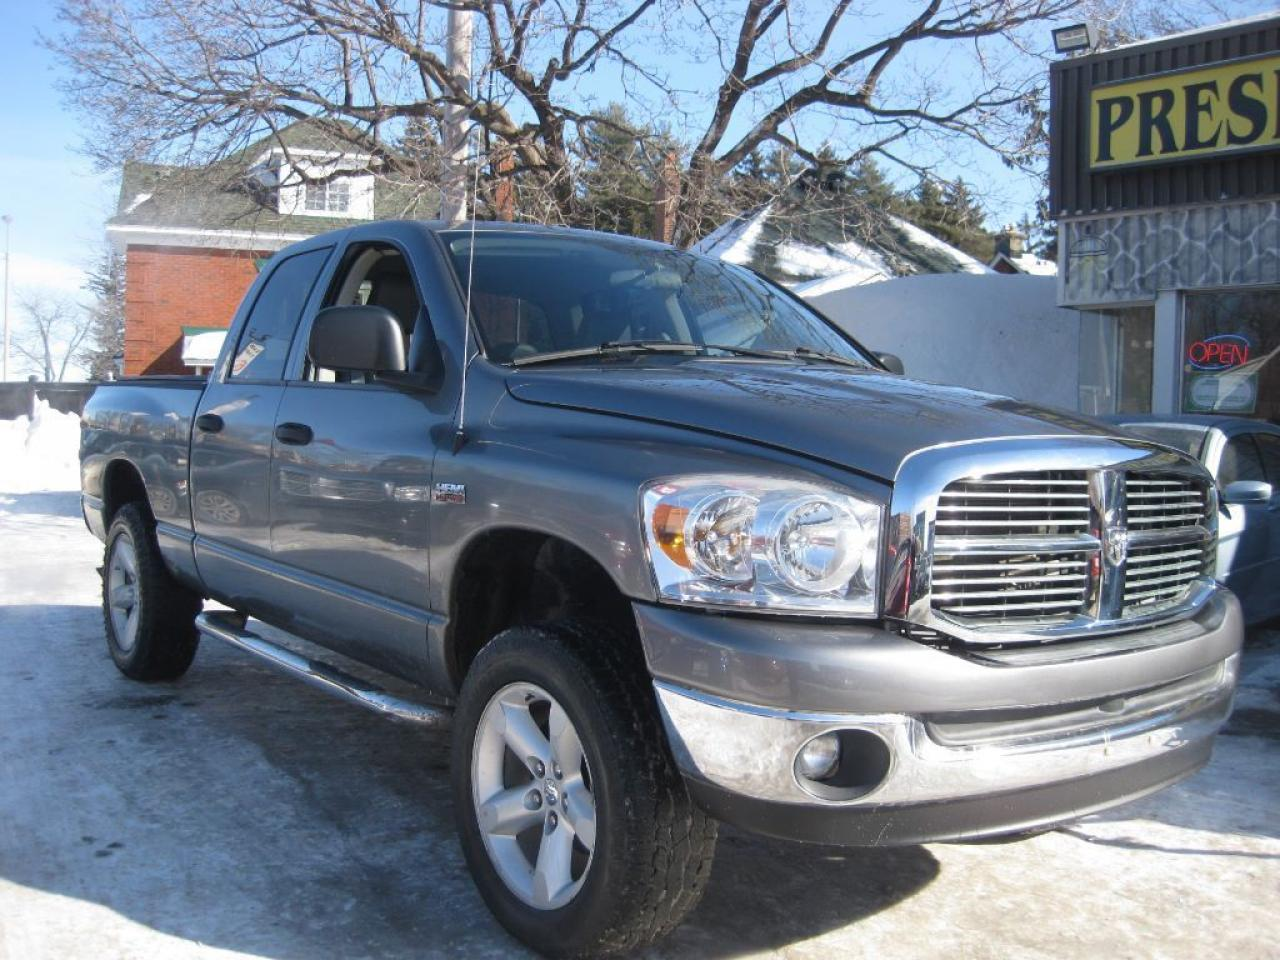 2008 Dodge Ram 1500 Laramie, 4x4 leather,p/w p/l a/c.keyless,mp3 input